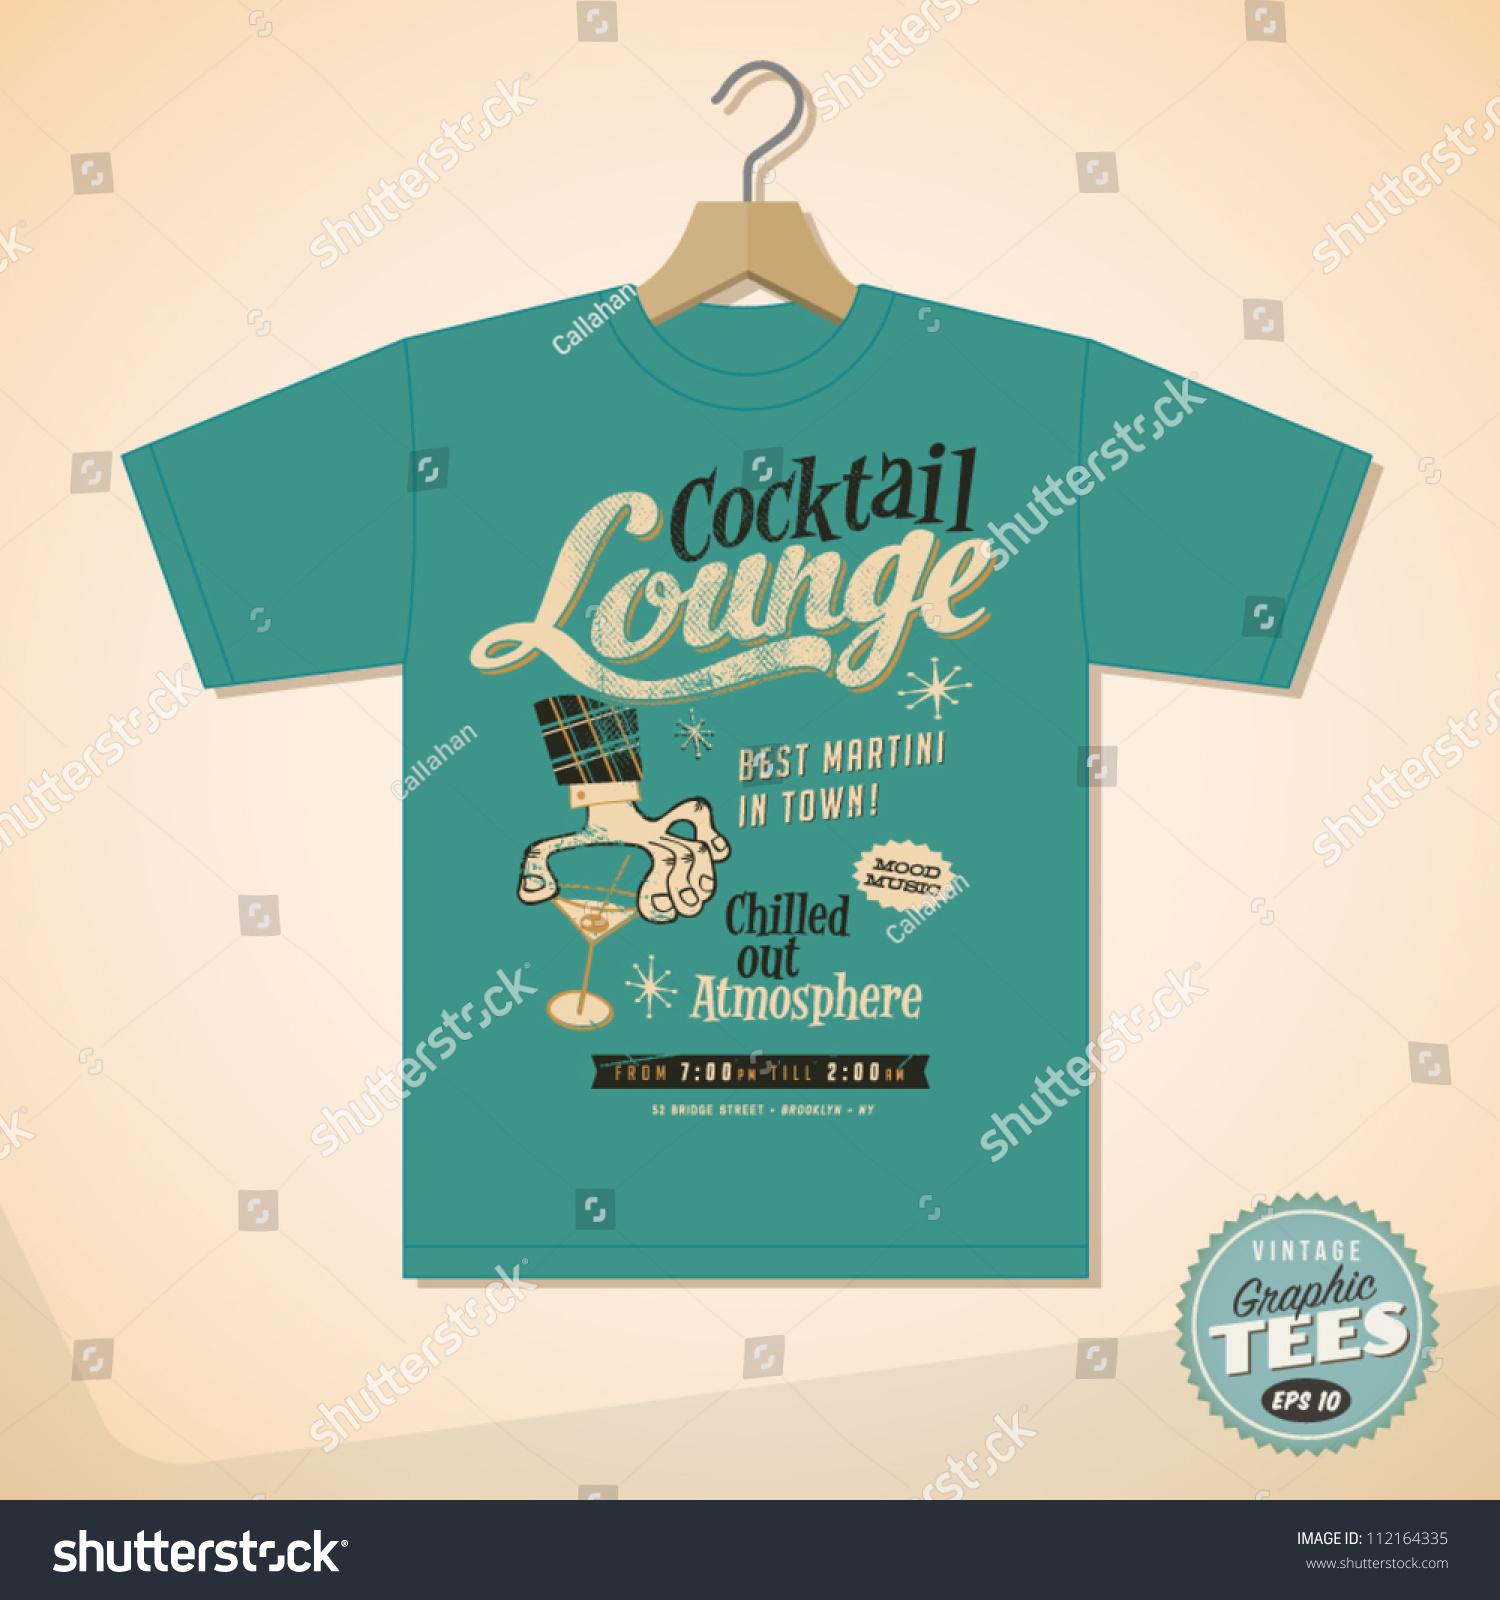 Shirt design vintage - Vintage Graphic T Shirt Design Cocktail Lounge Vector Eps10 Grunge Effects Can